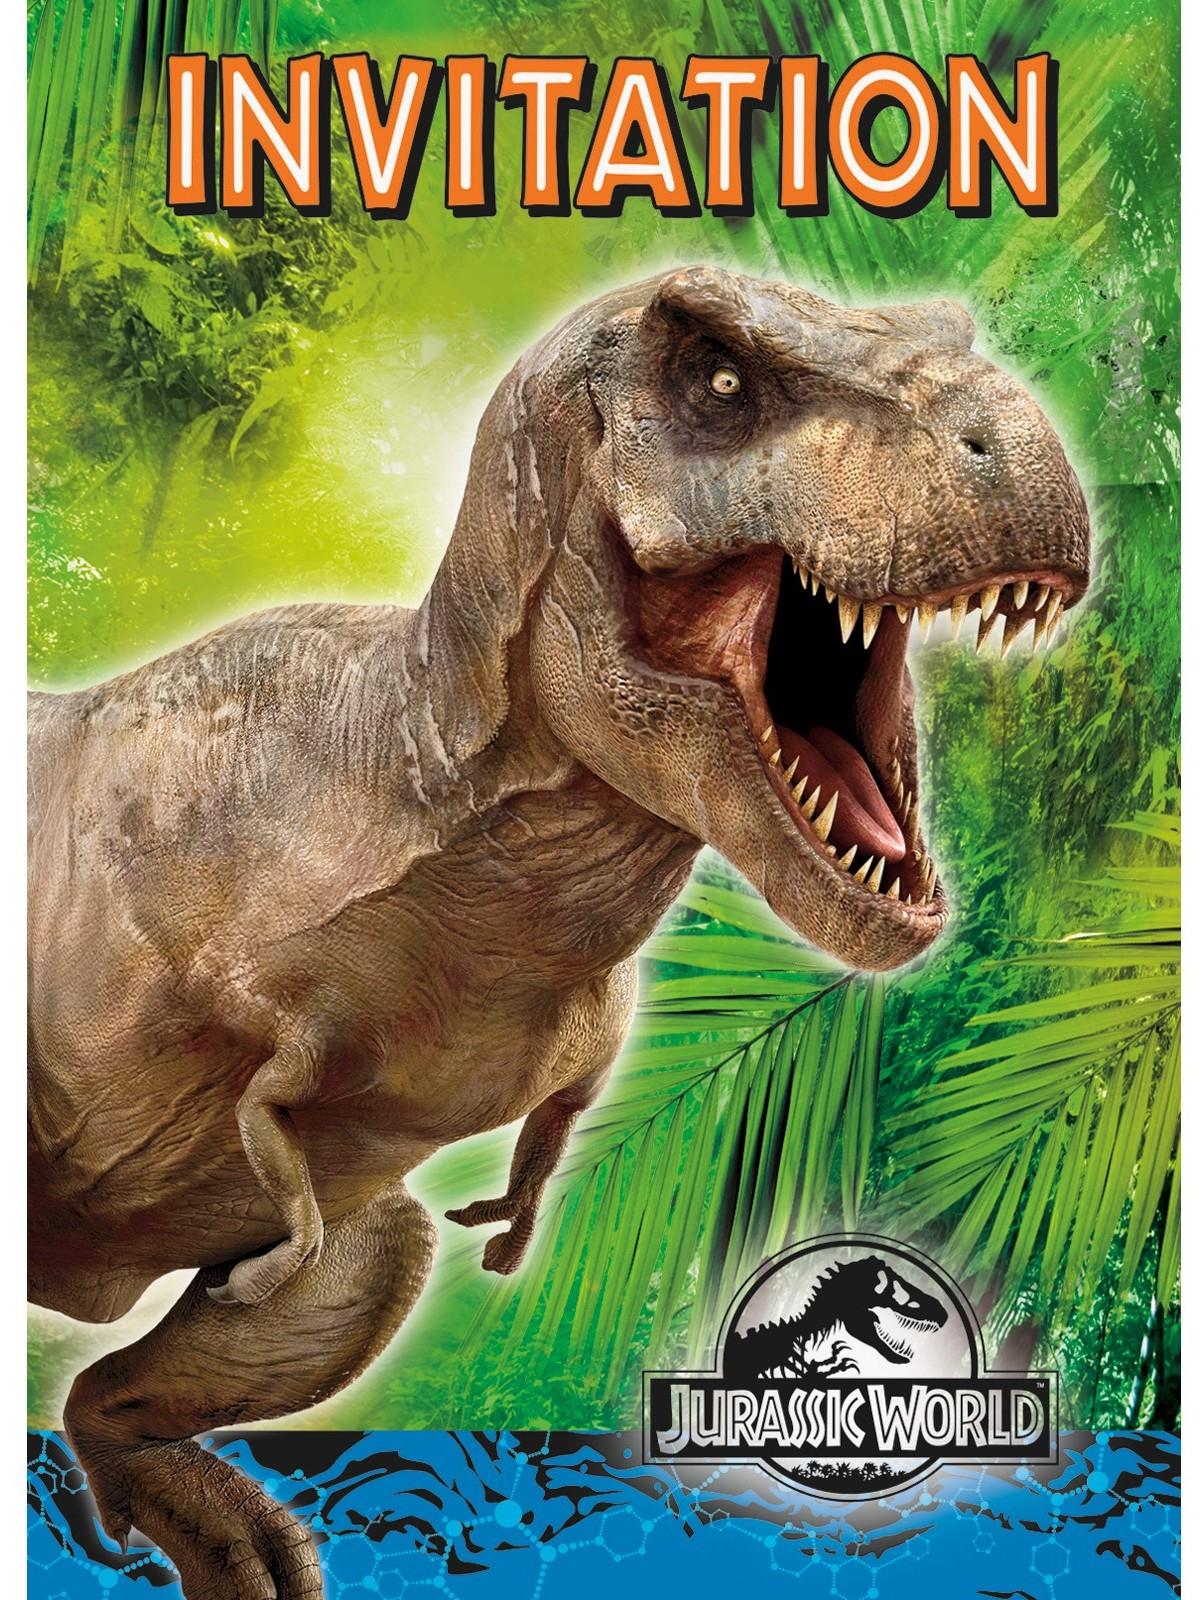 Jurassic World Dinosaur Party Planning Ideas & Supplies - Free Printable Jurassic Park Invitations